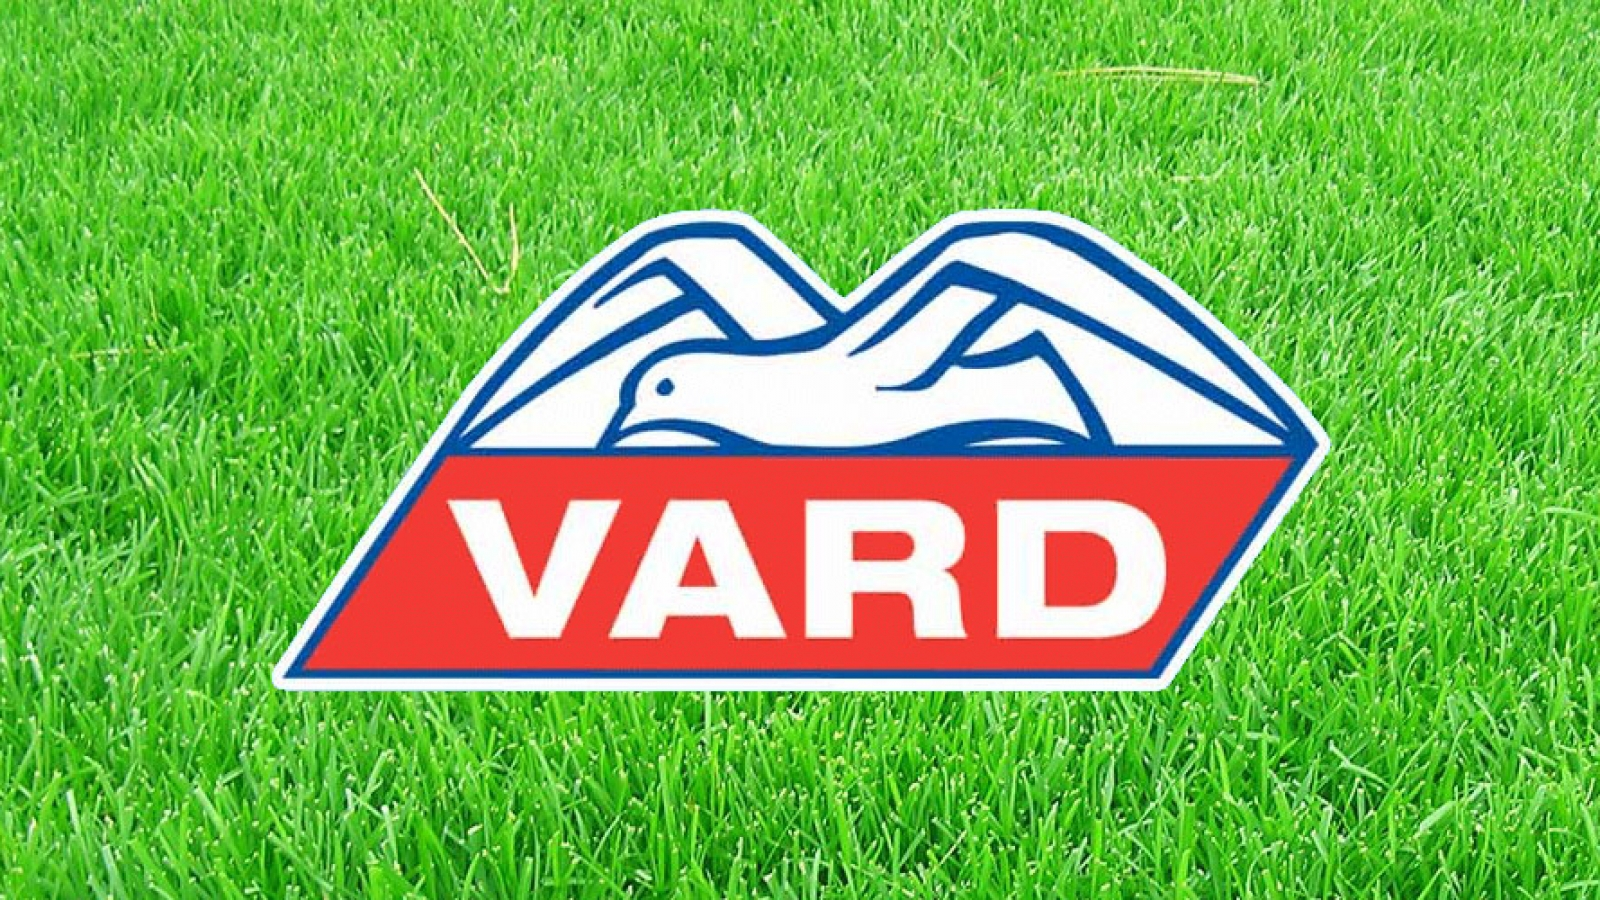 logo vard